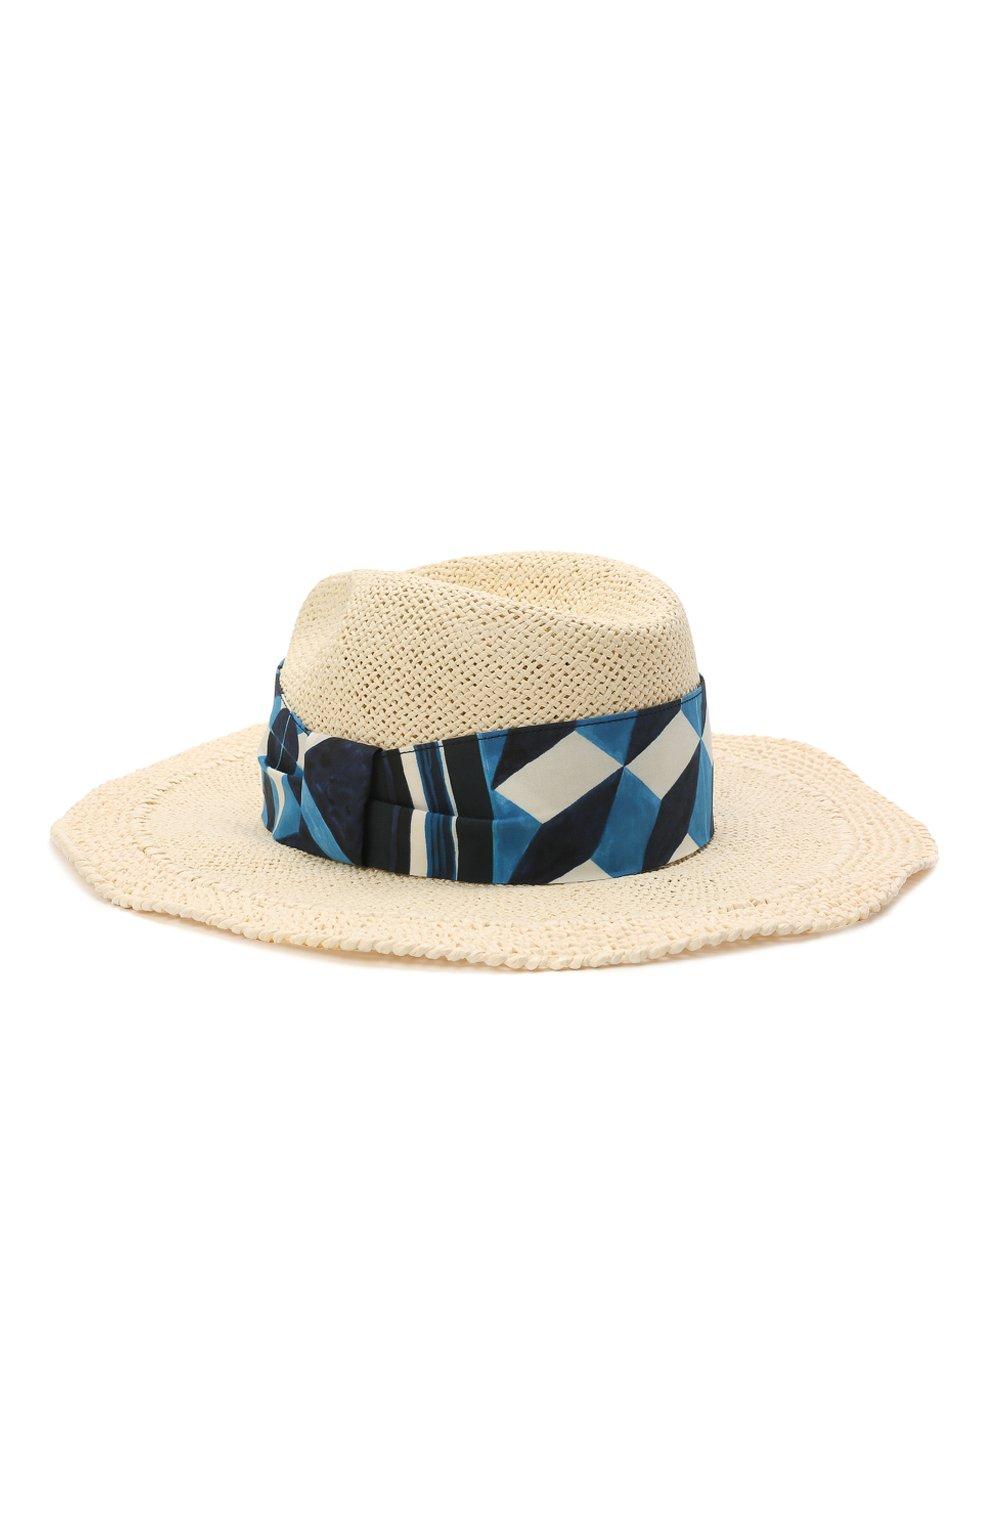 Мужская шляпа DOLCE & GABBANA бежевого цвета, арт. GH694Z/G3UAP | Фото 1